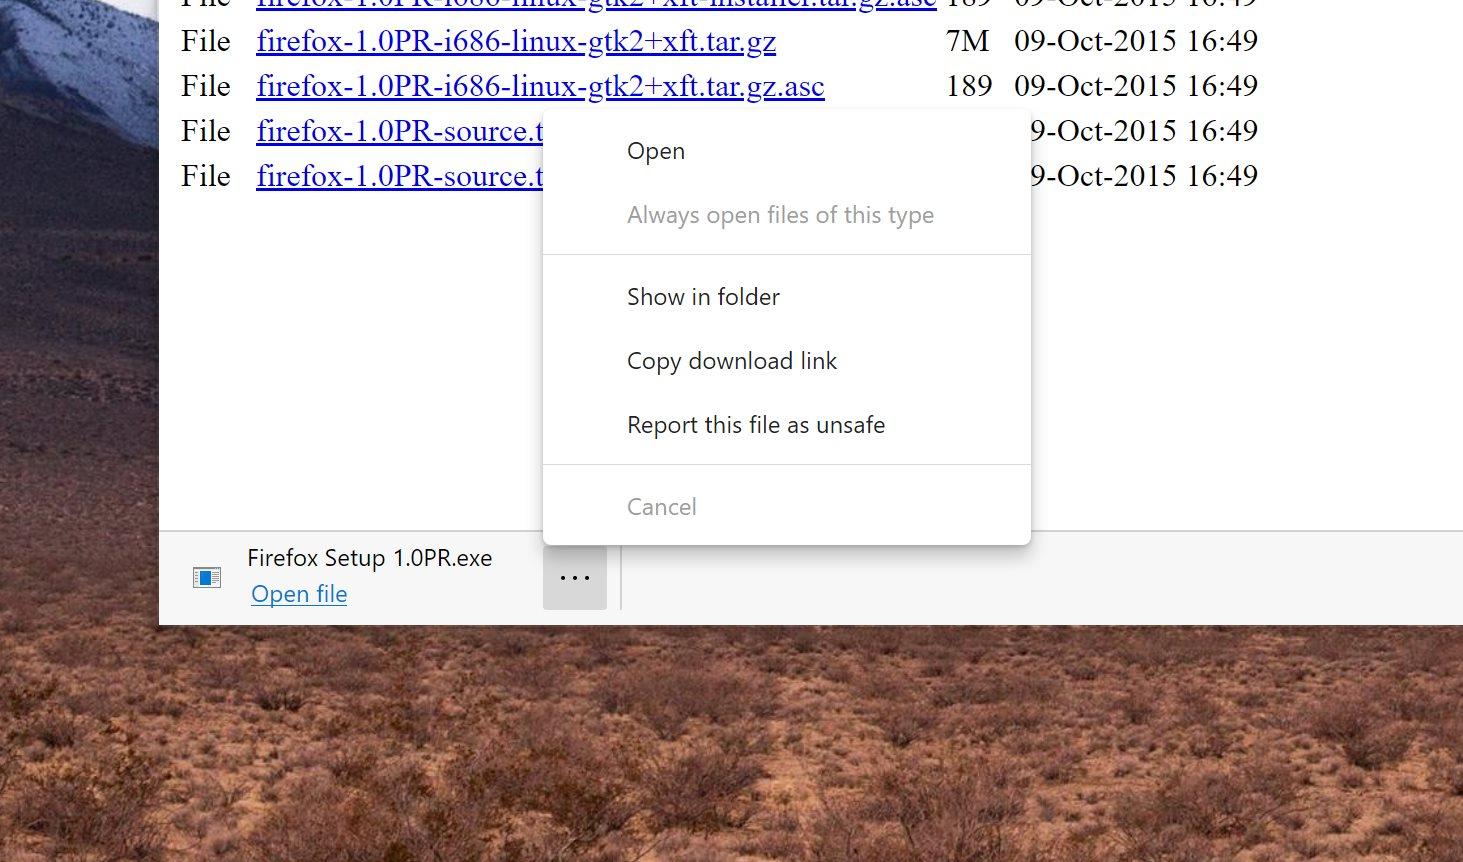 Microsoft Finally Shuts Down Internet Explorer